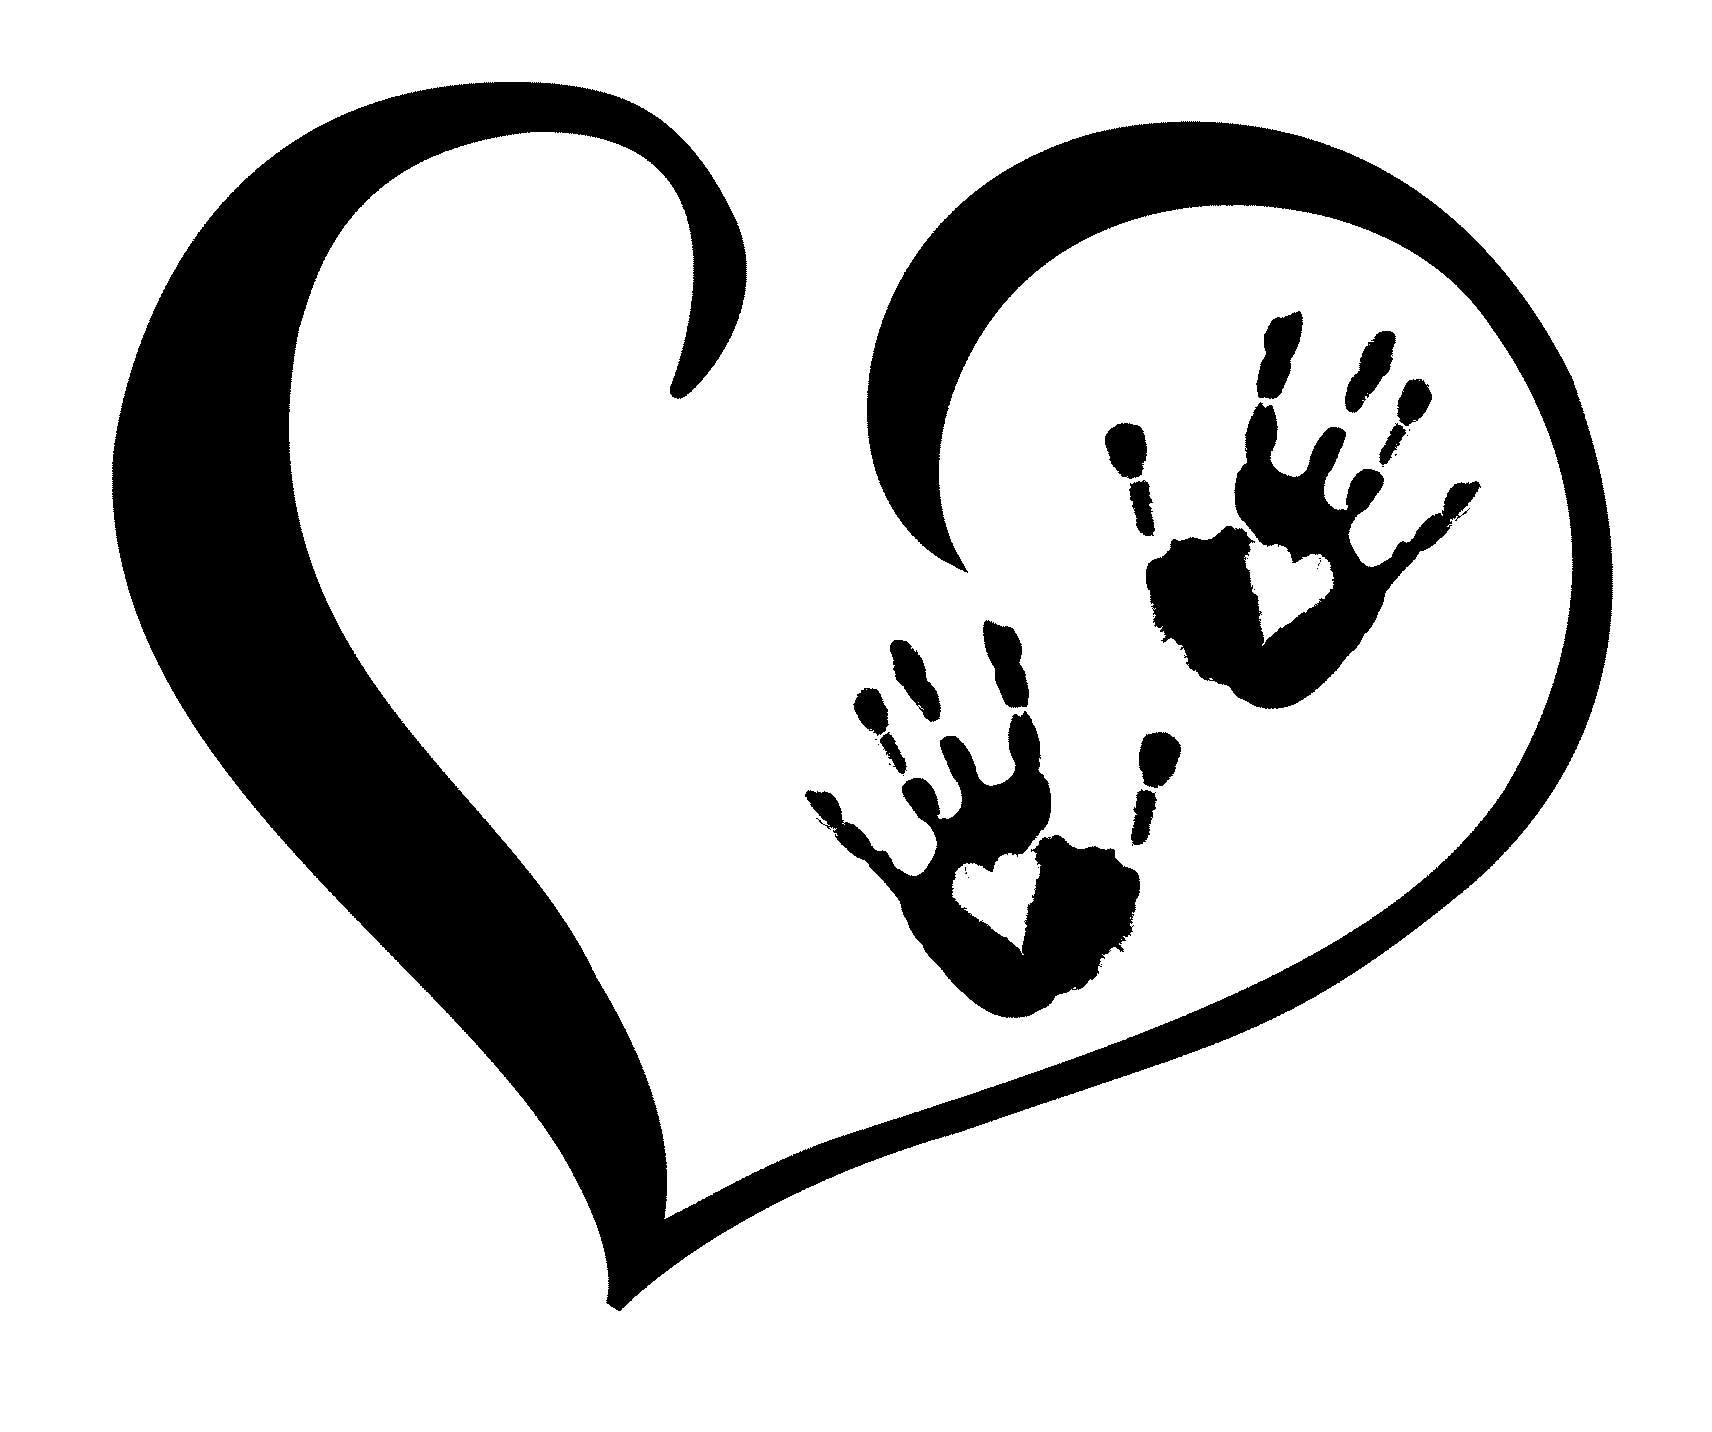 Healing clipart Clipart Healing Hands Clipart Heart